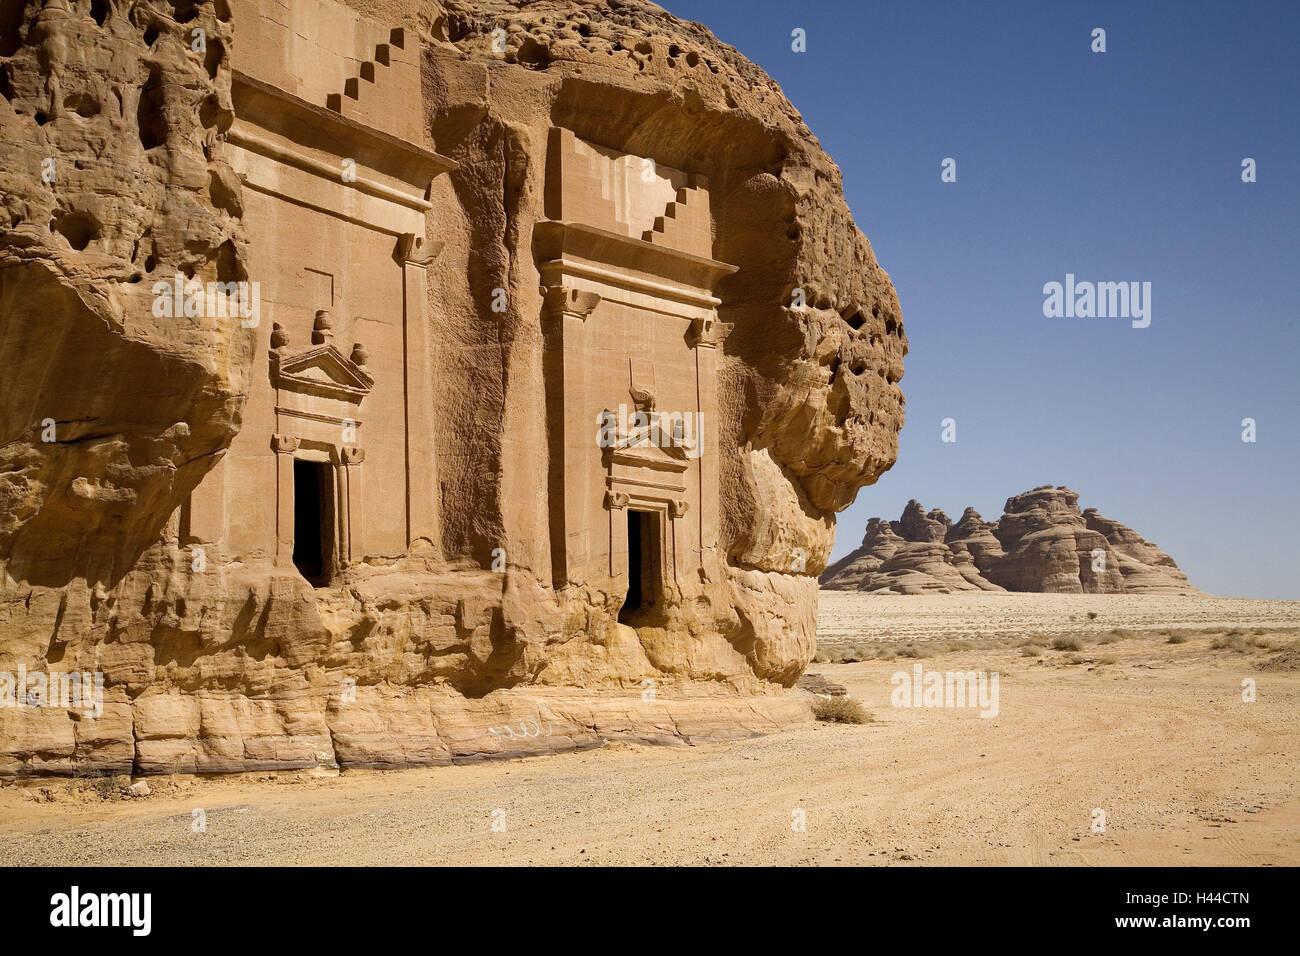 Image result for Tabuk, Saudi Arabia